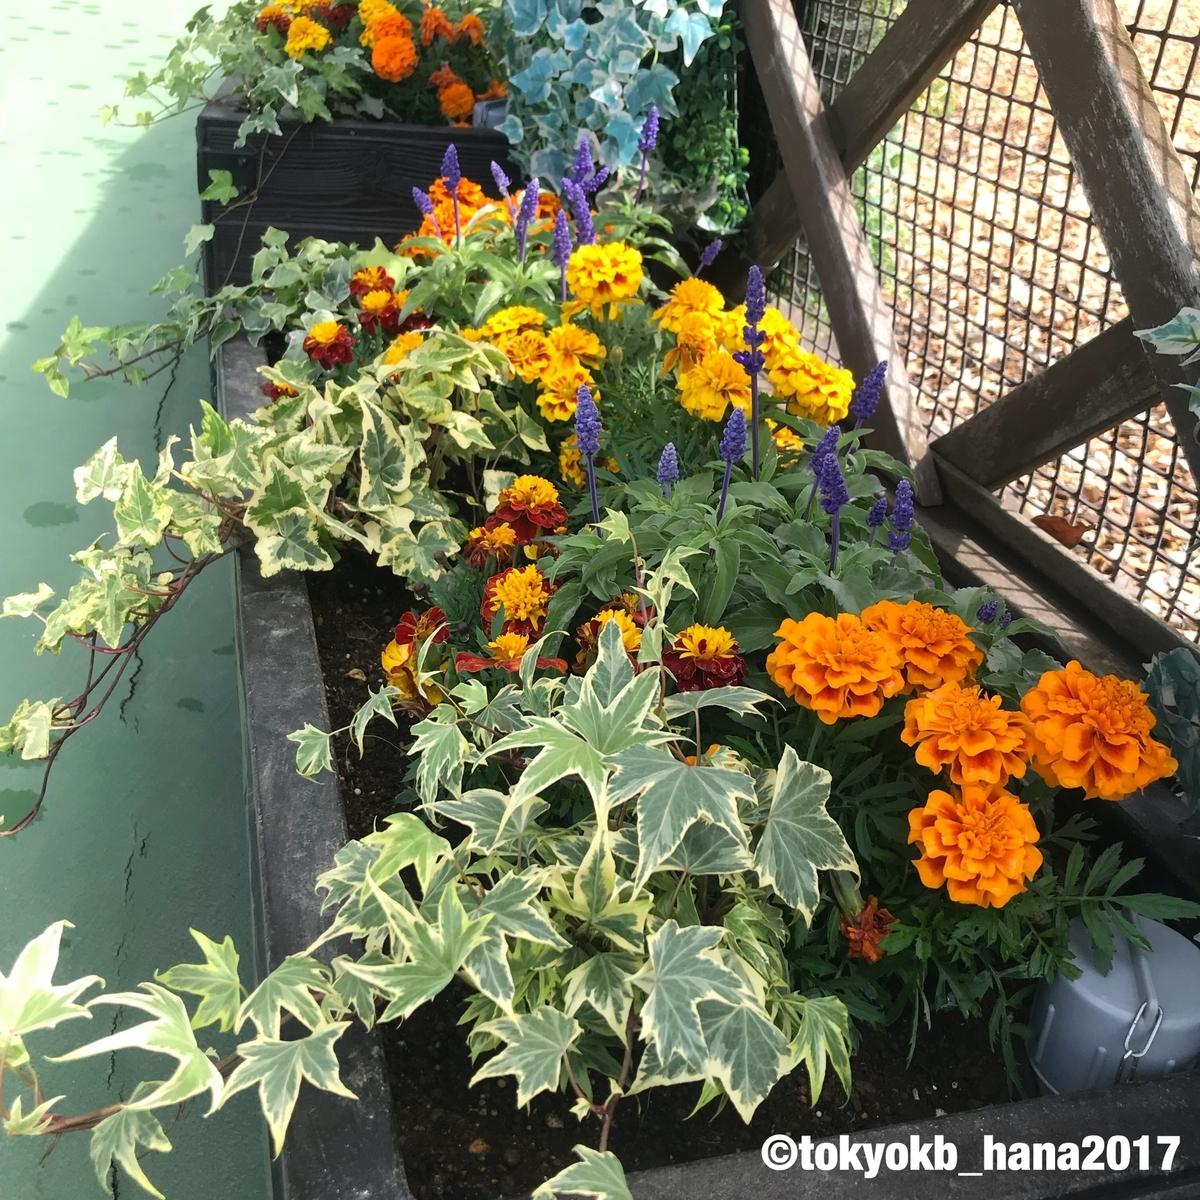 f:id:tokyokb_hana2017:20190506133326j:plain